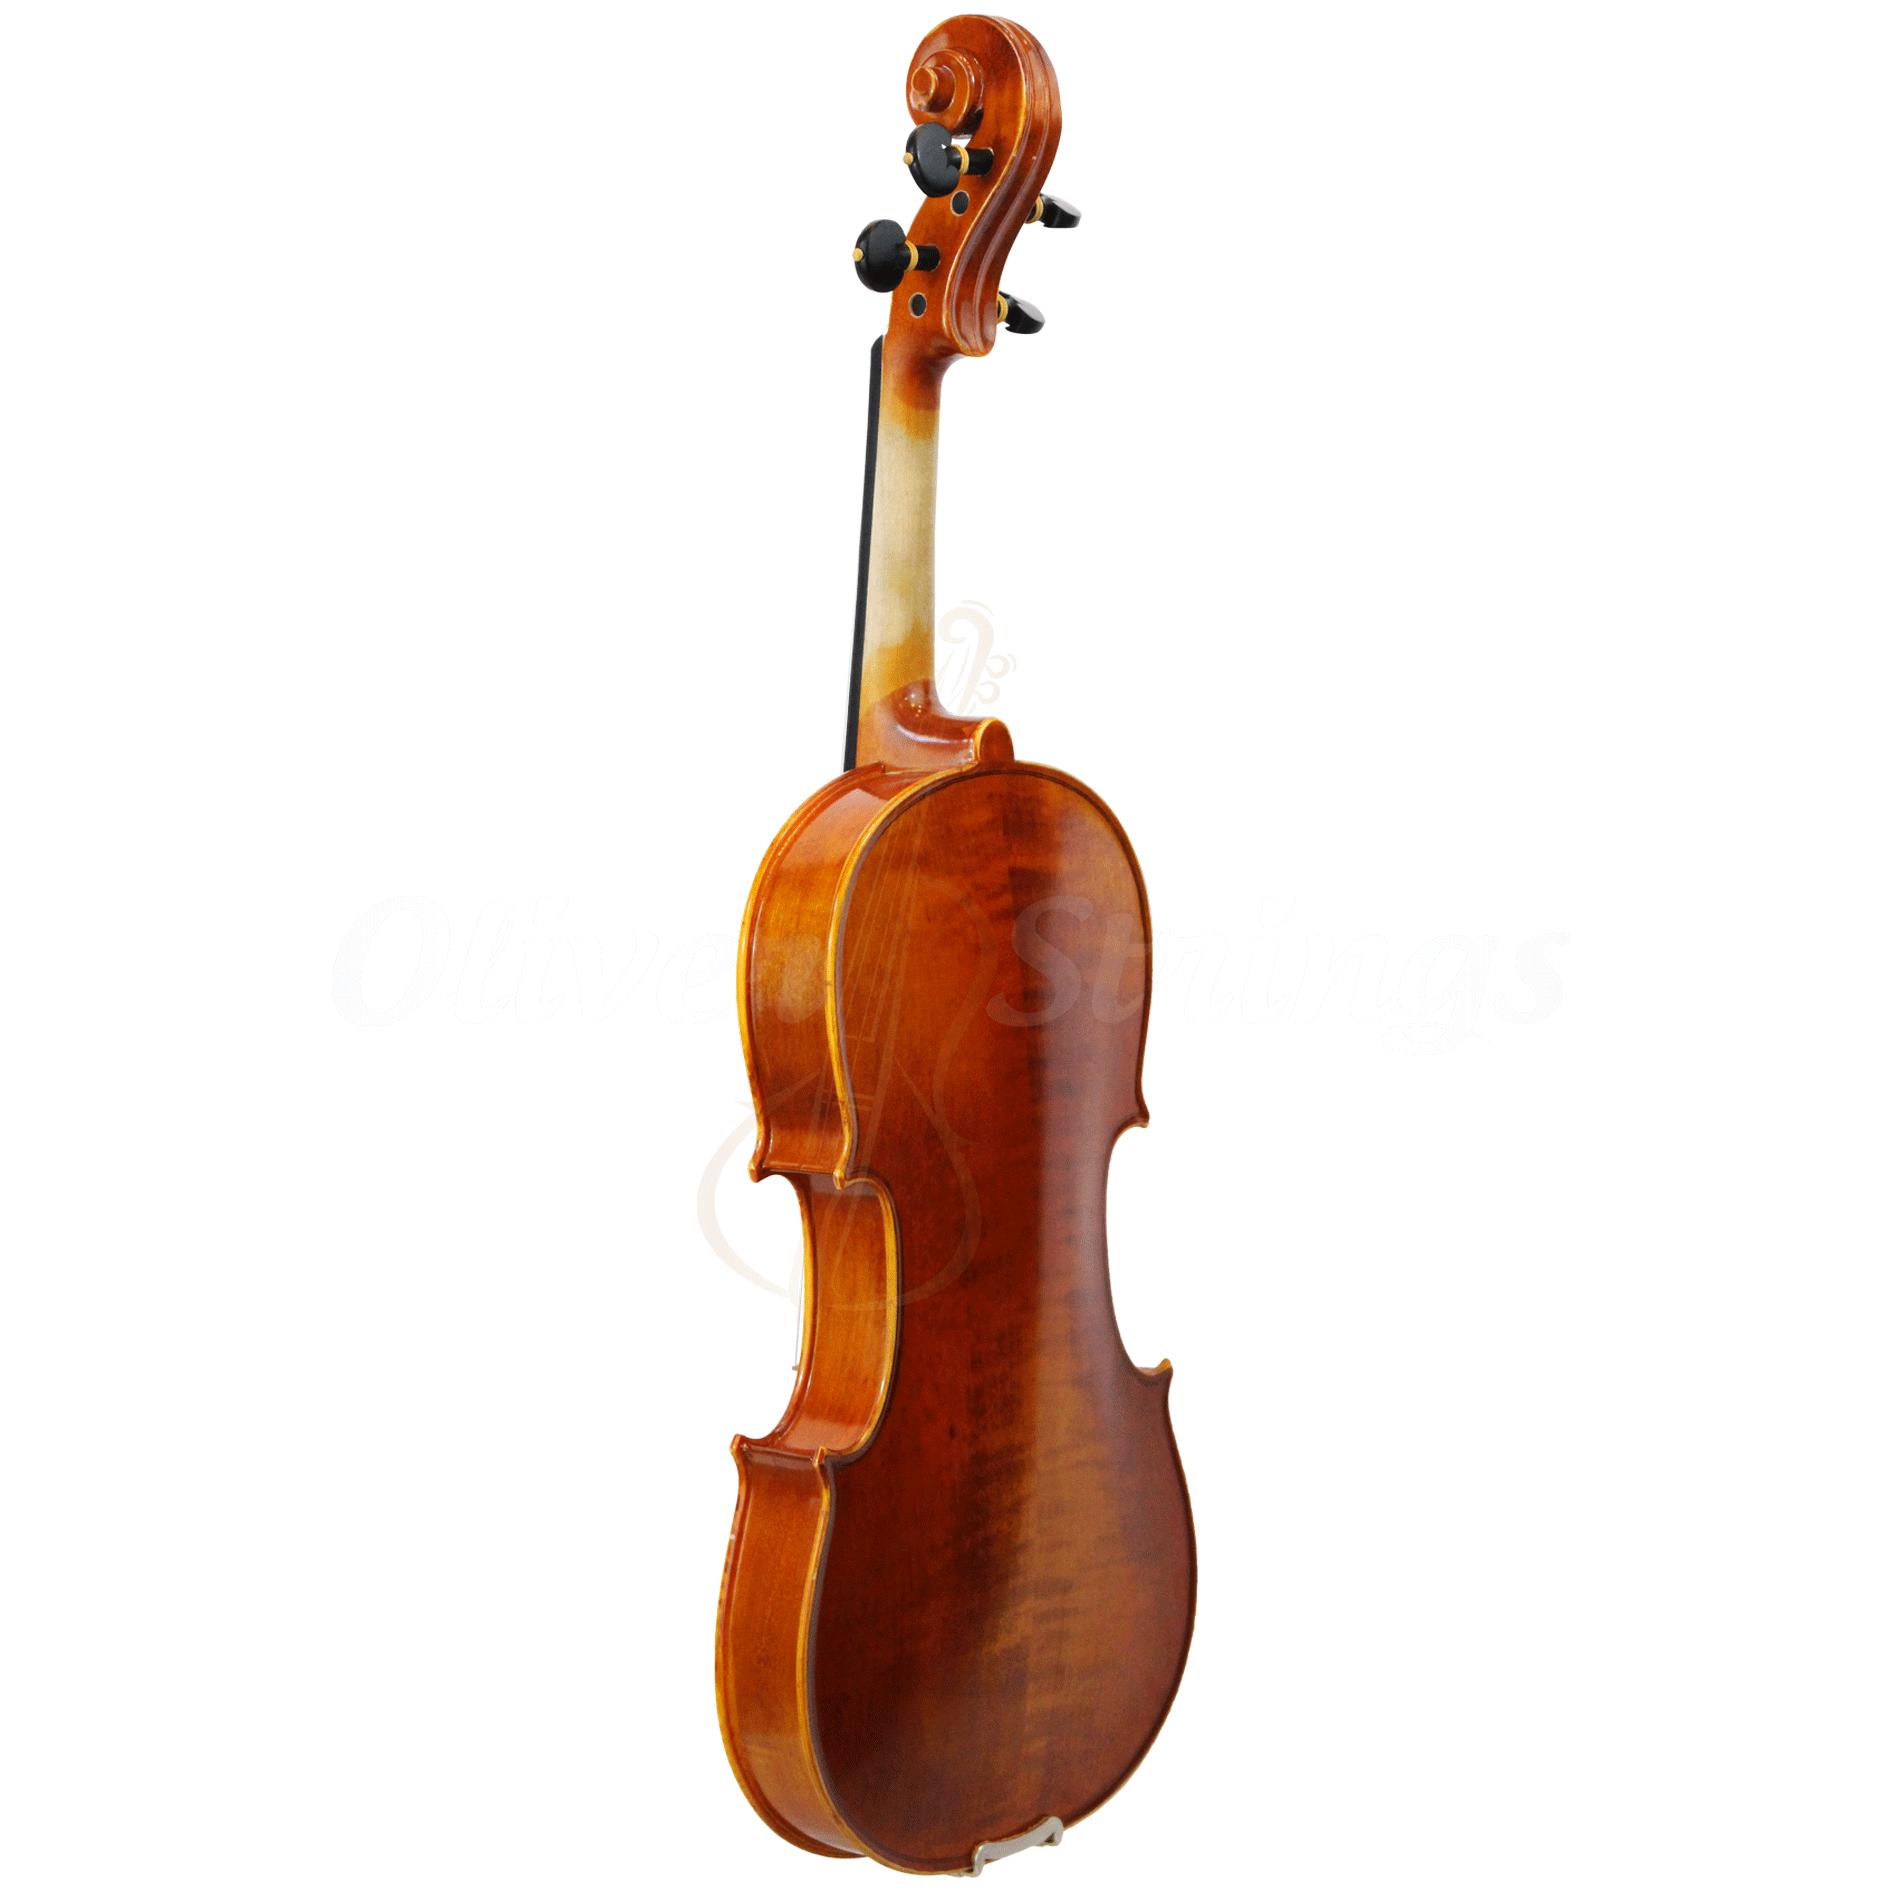 Violino intermediário modelo strad fundo bipartido fosco 4/4